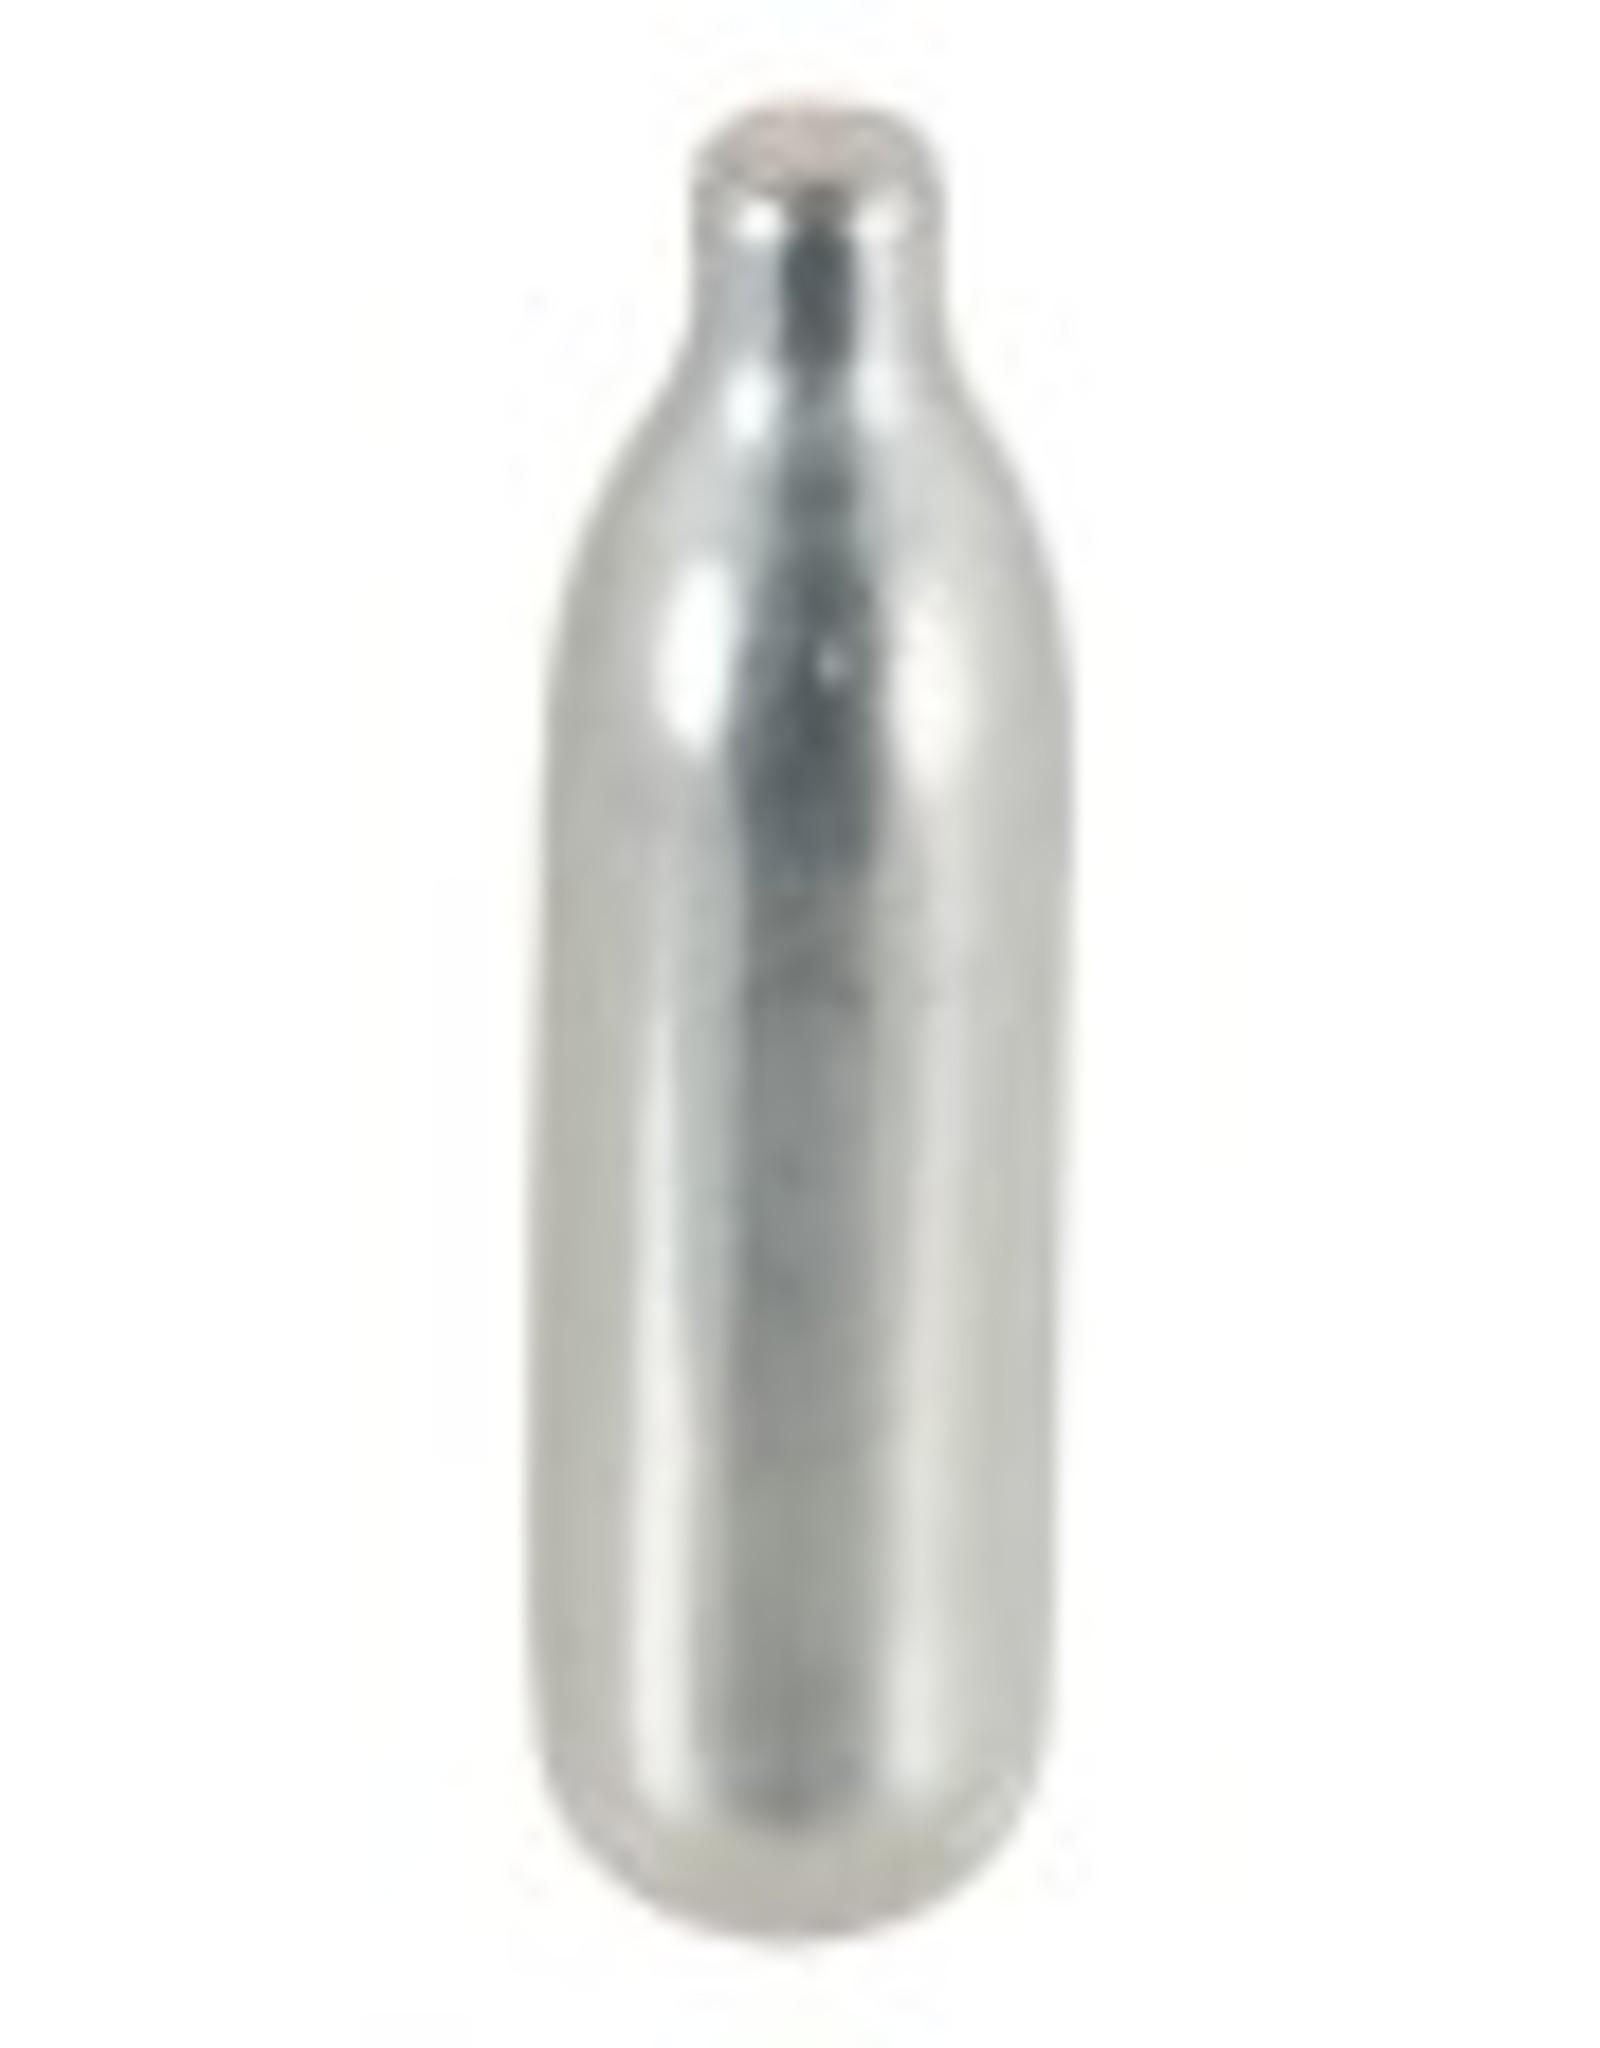 8 gram CO2 Cartridges - 10 Pack